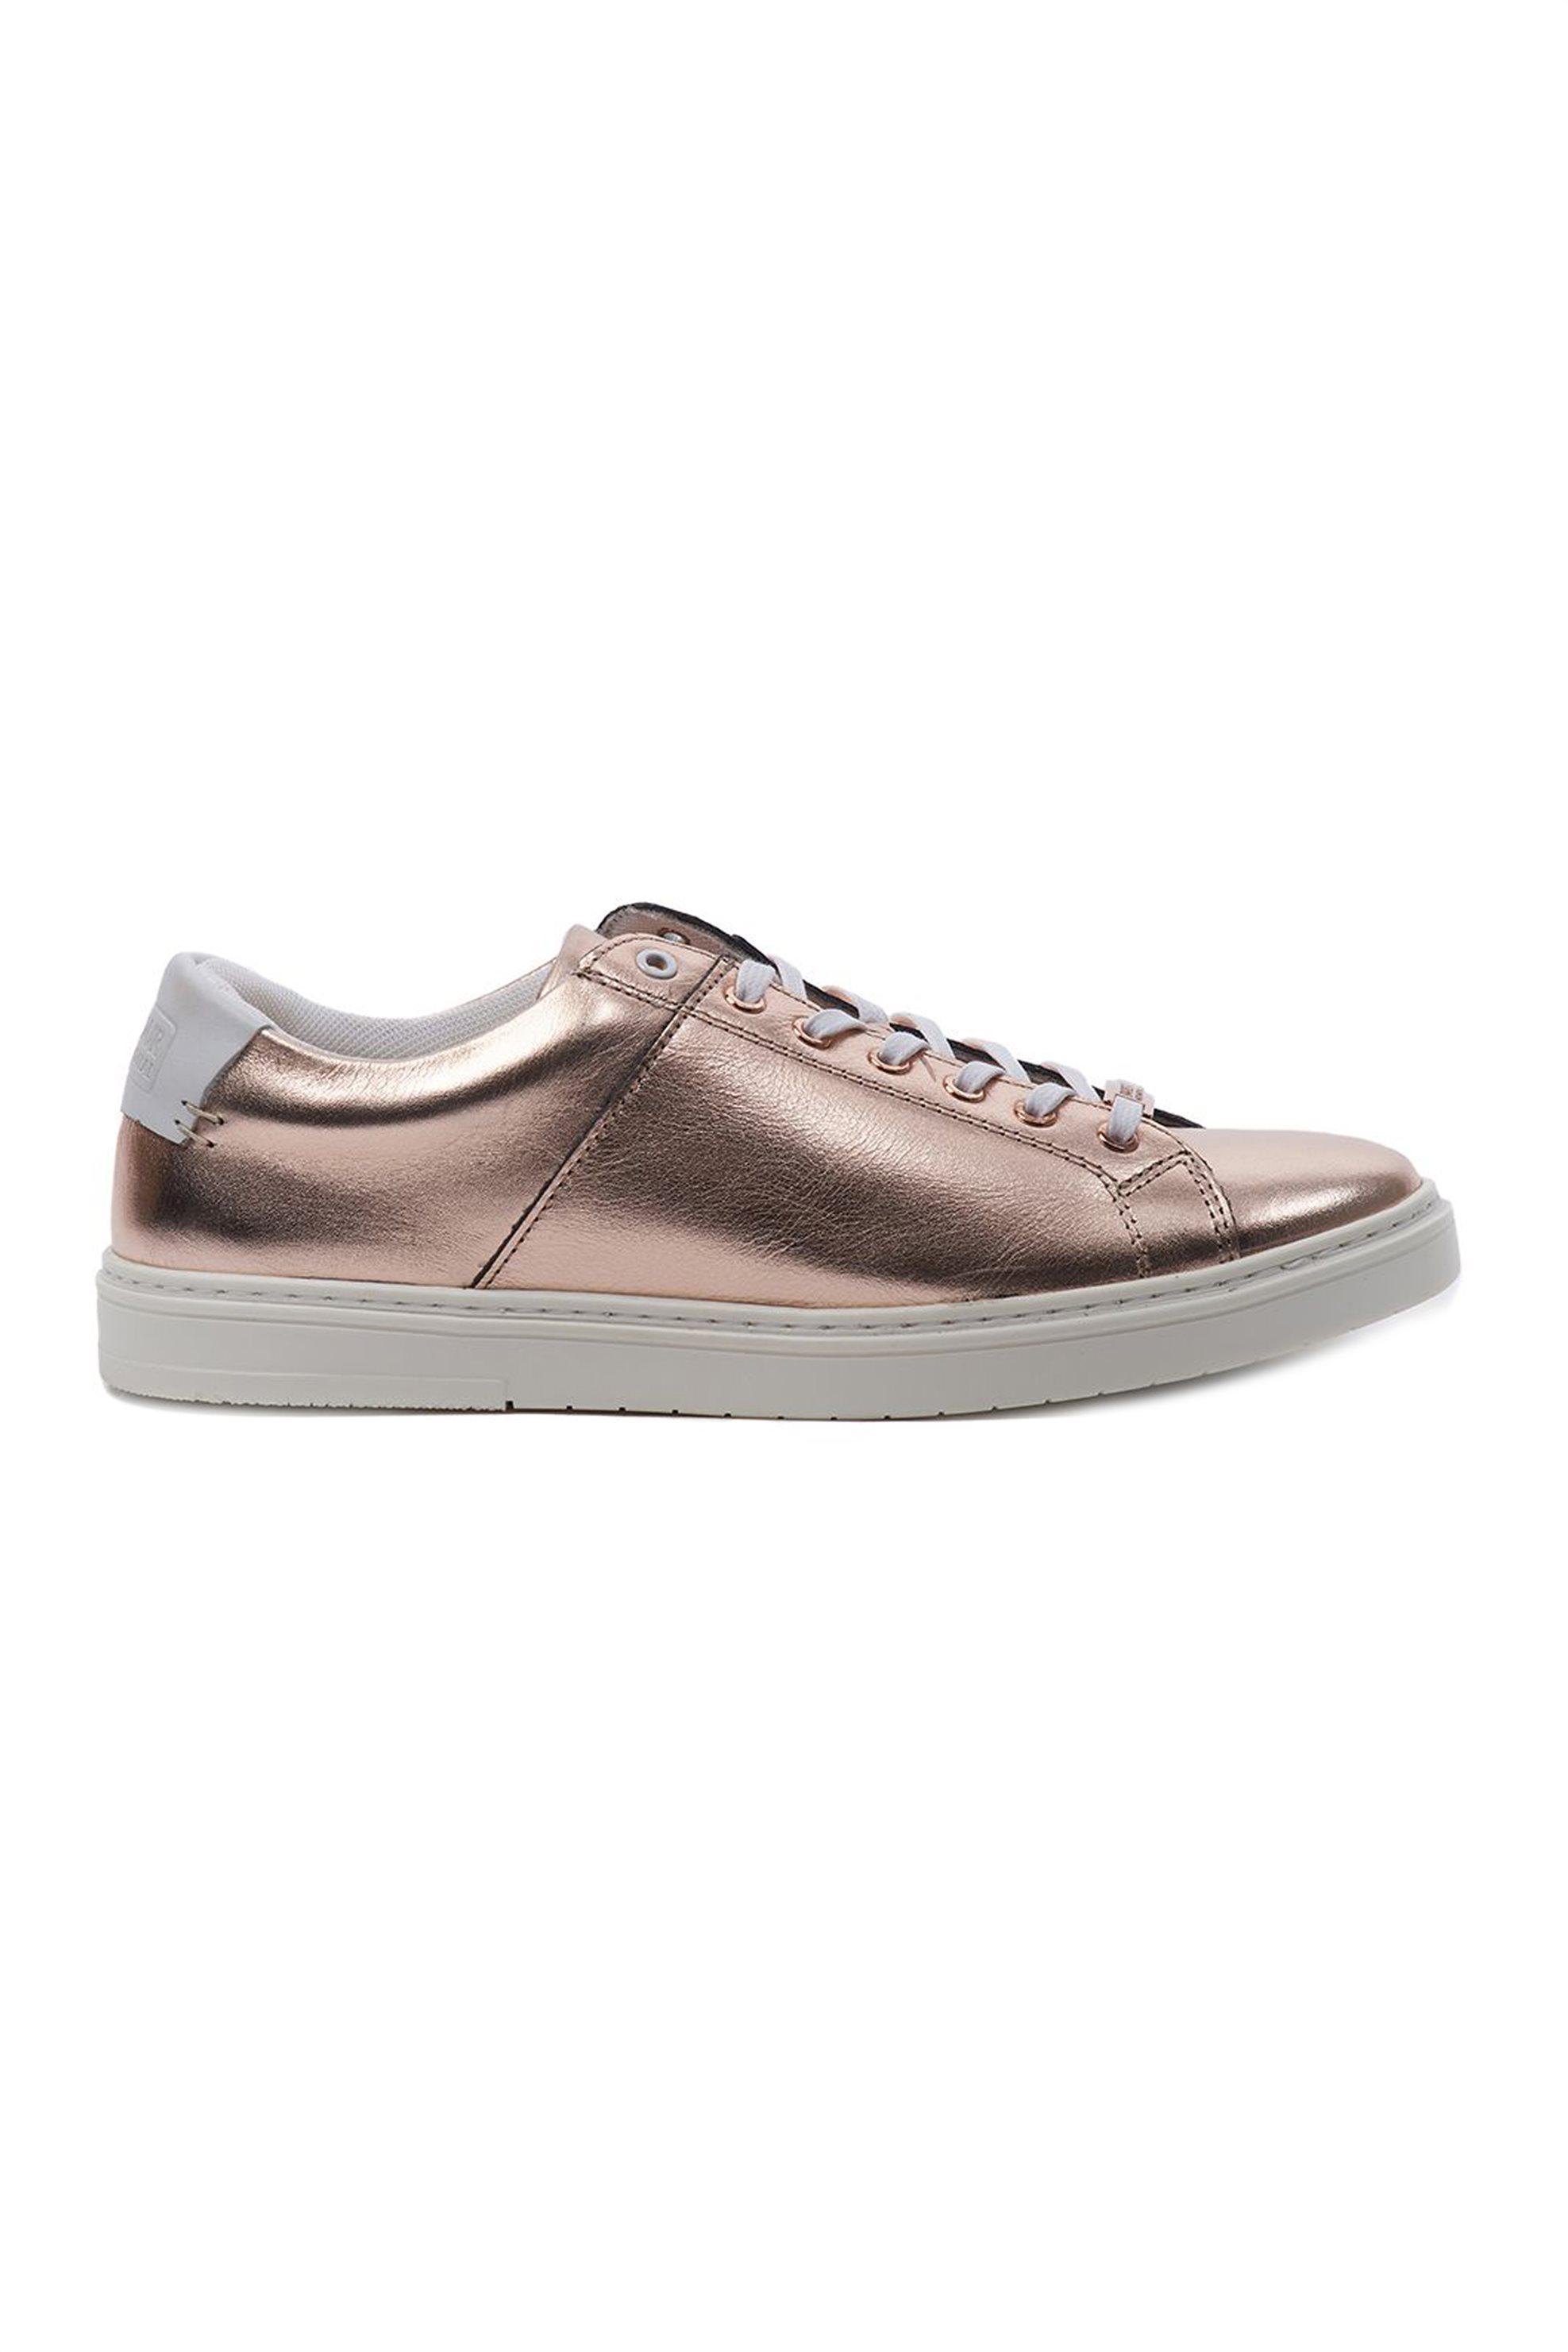 "Barbour γυναικεία sneakers με κορδόνια ""Herrera Trainers"" – LFO0307 – Χάλκινο"